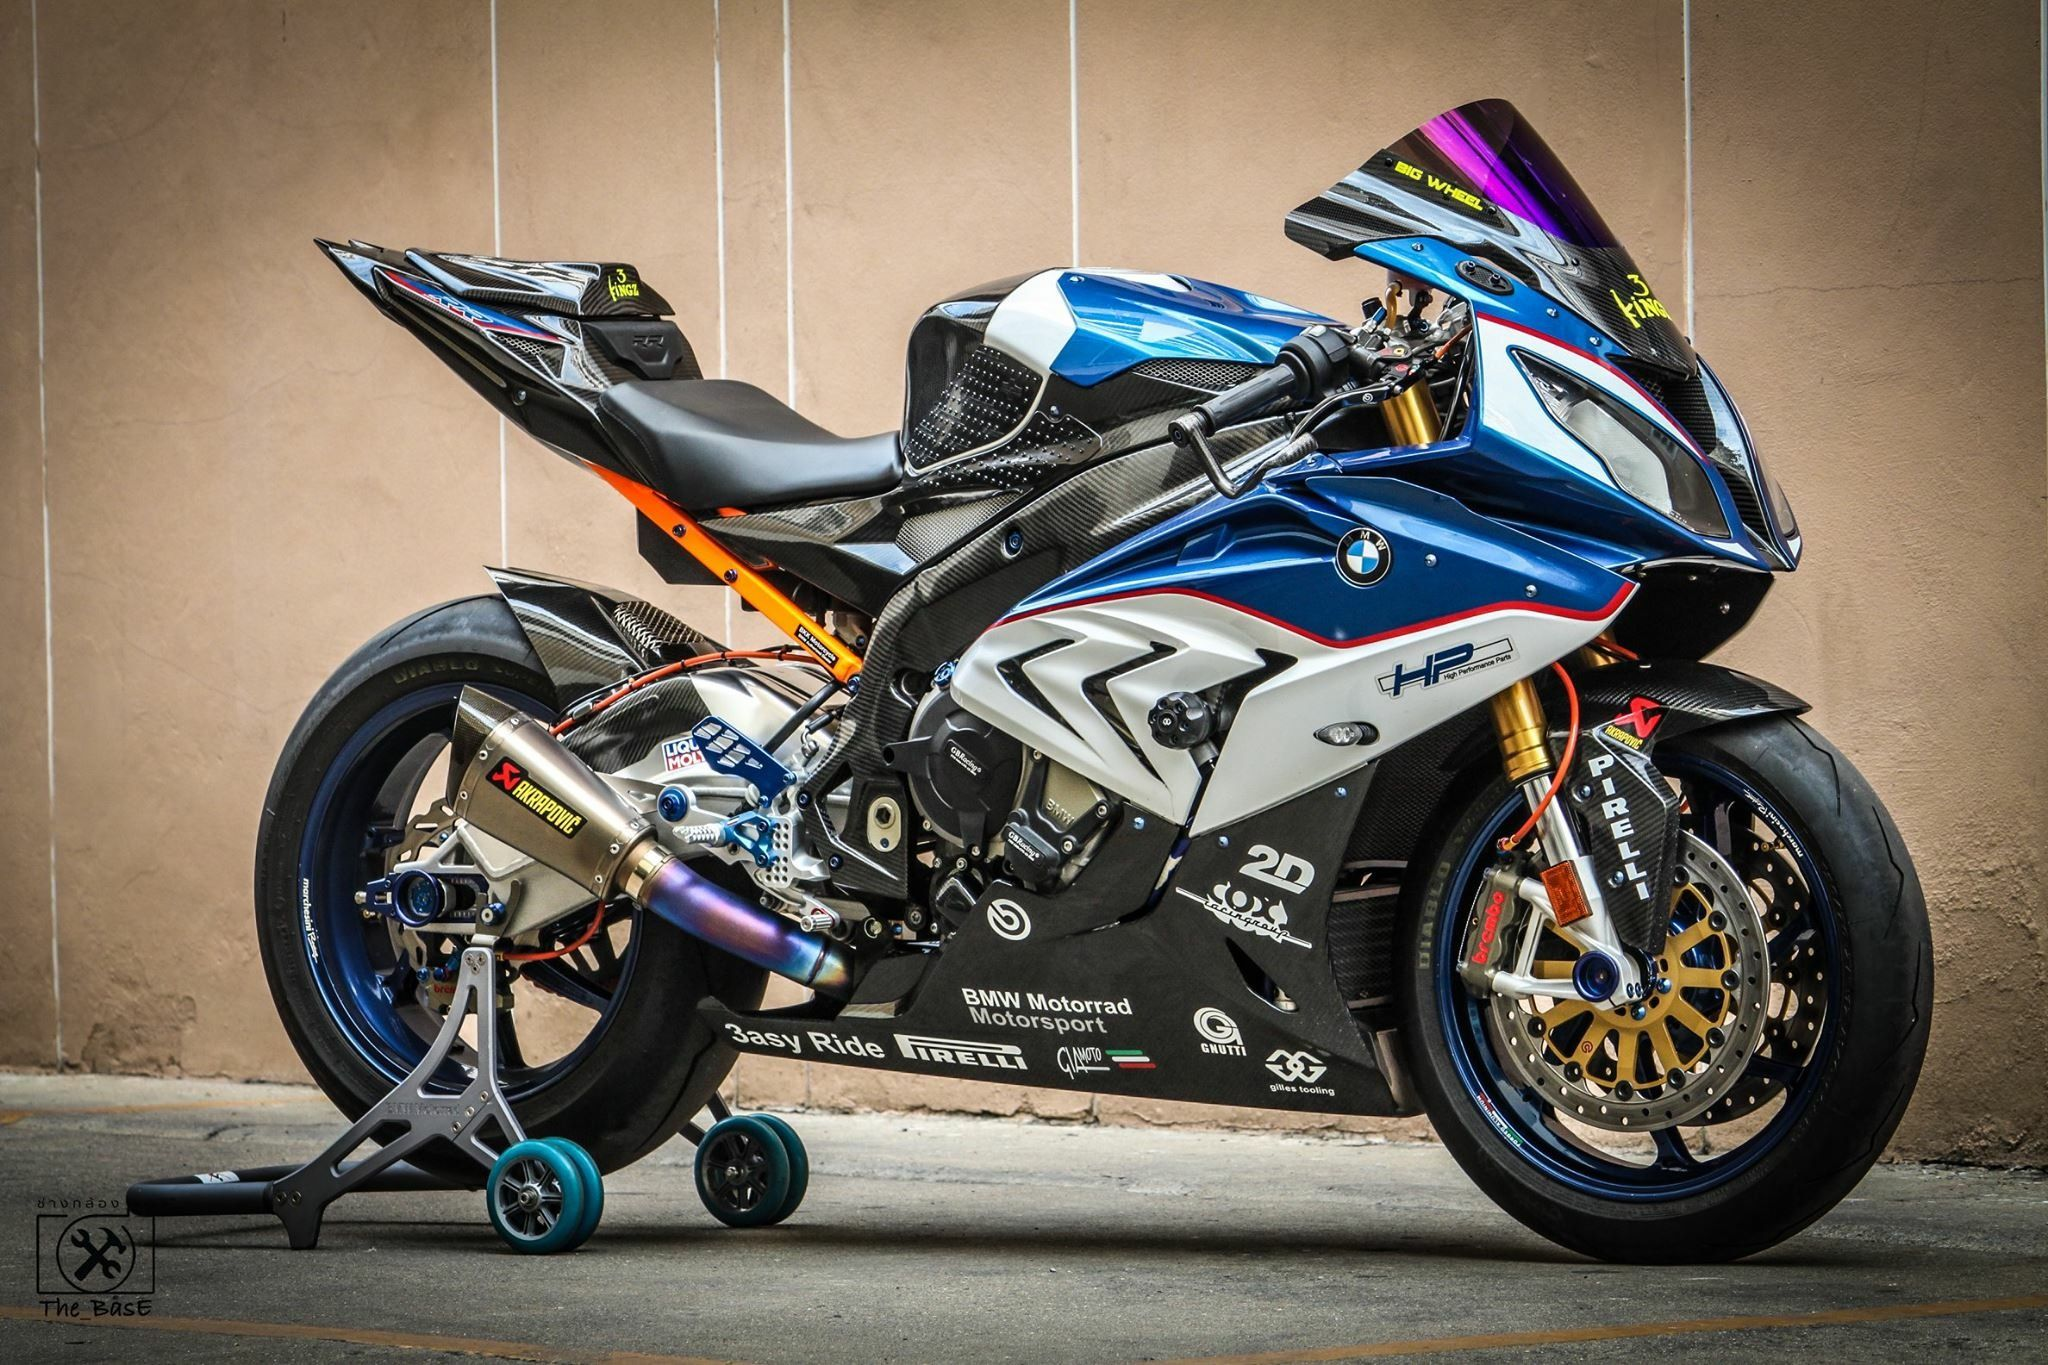 S1000rr Bmw Motorcycle S1000rr Bmw S1000rr Super Bikes